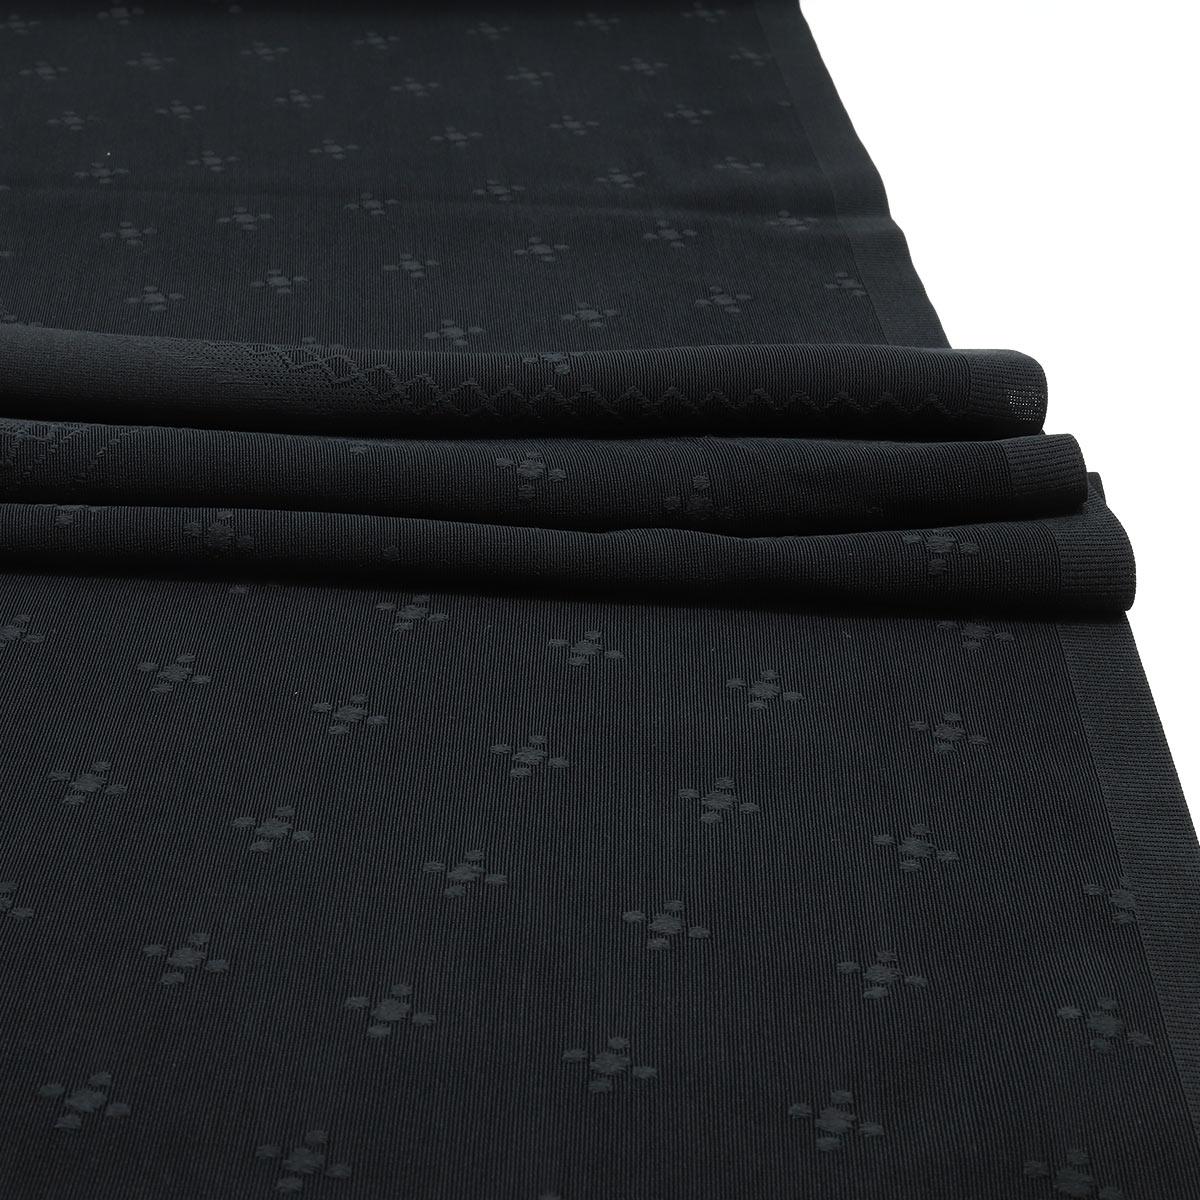 SU 116 Ткань эластичная бельевая 38 см*10